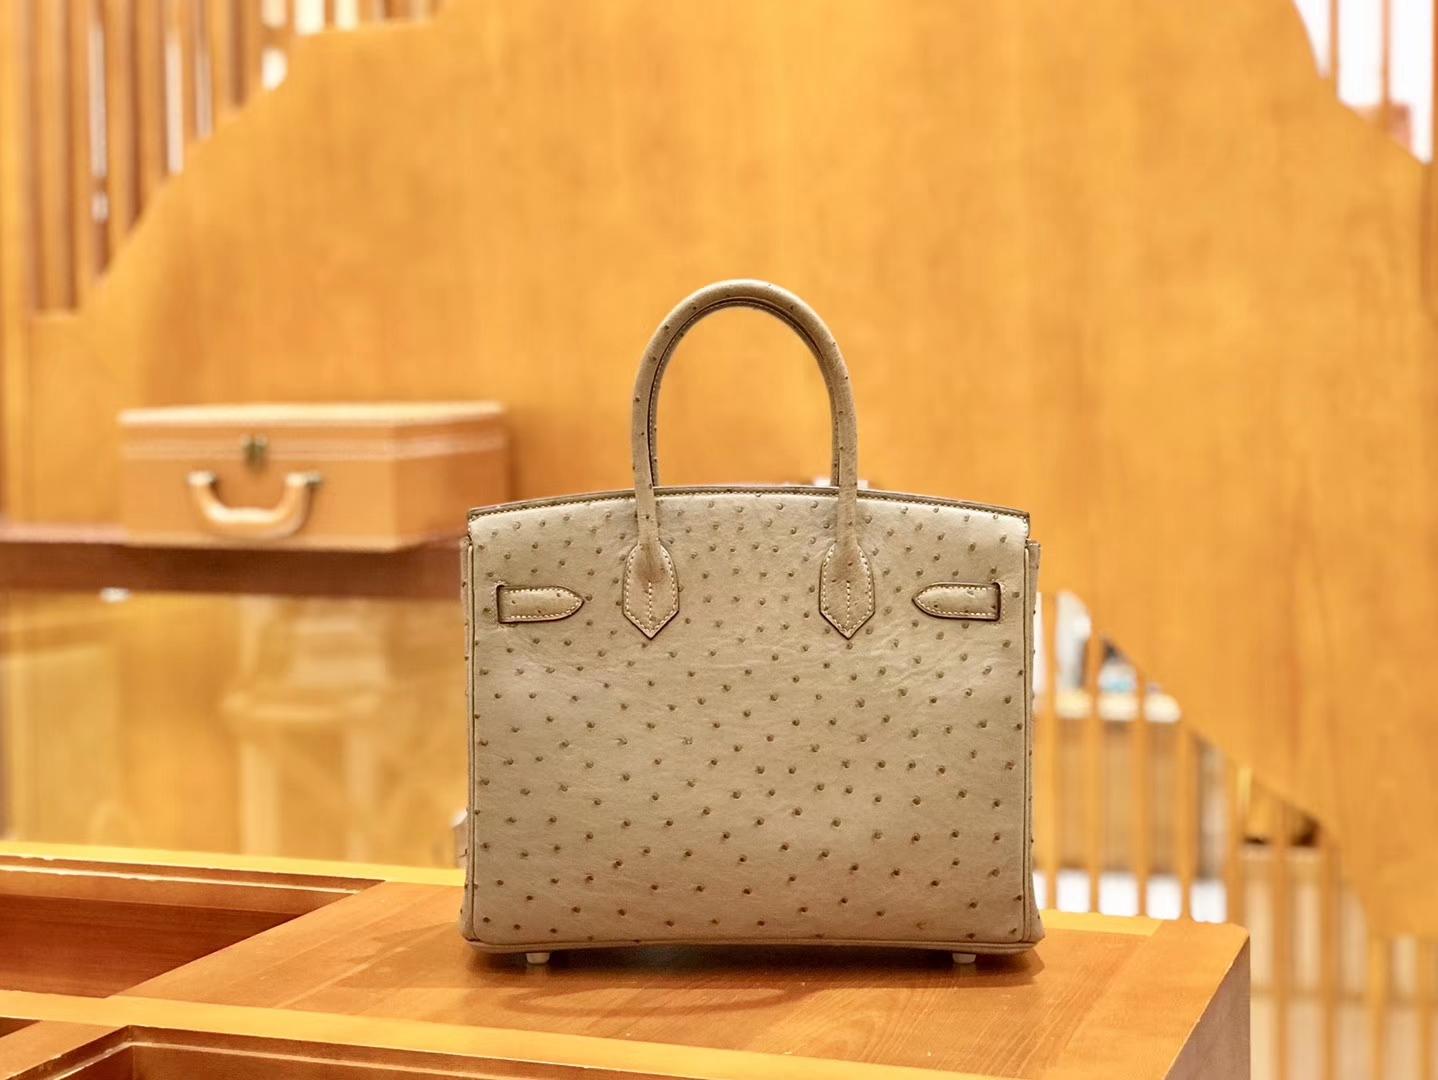 Hermès(爱马仕)Birkin 30cm 大象灰 金扣 鸵鸟皮 全手工缝制 现货